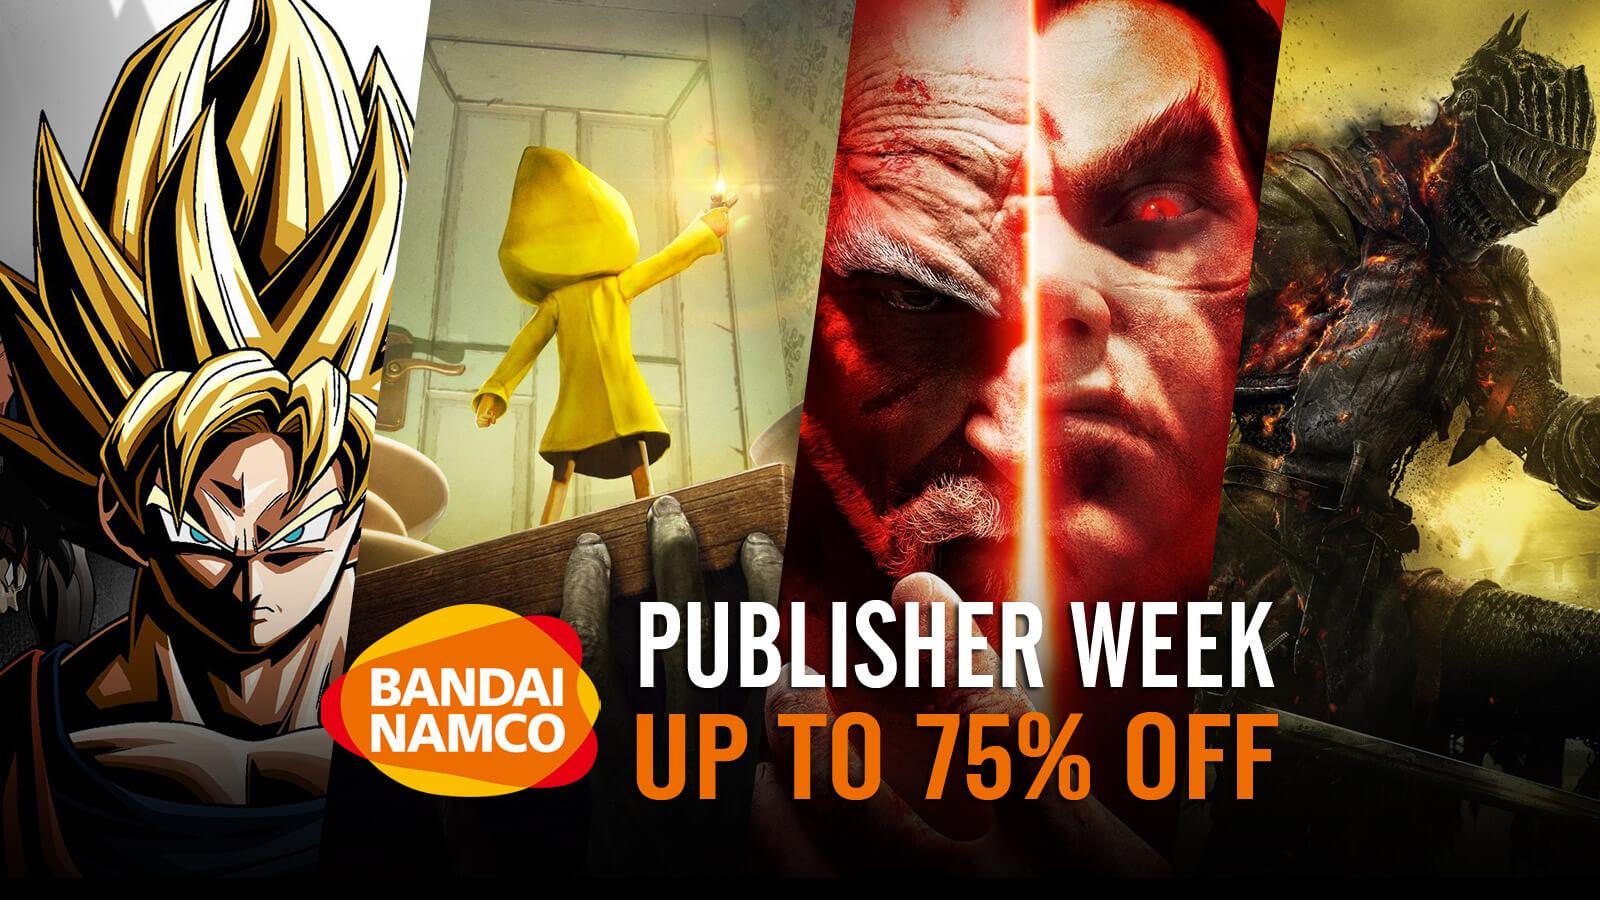 Humble Store Bandai Namco Publisher Week 2019 - Gameslaught